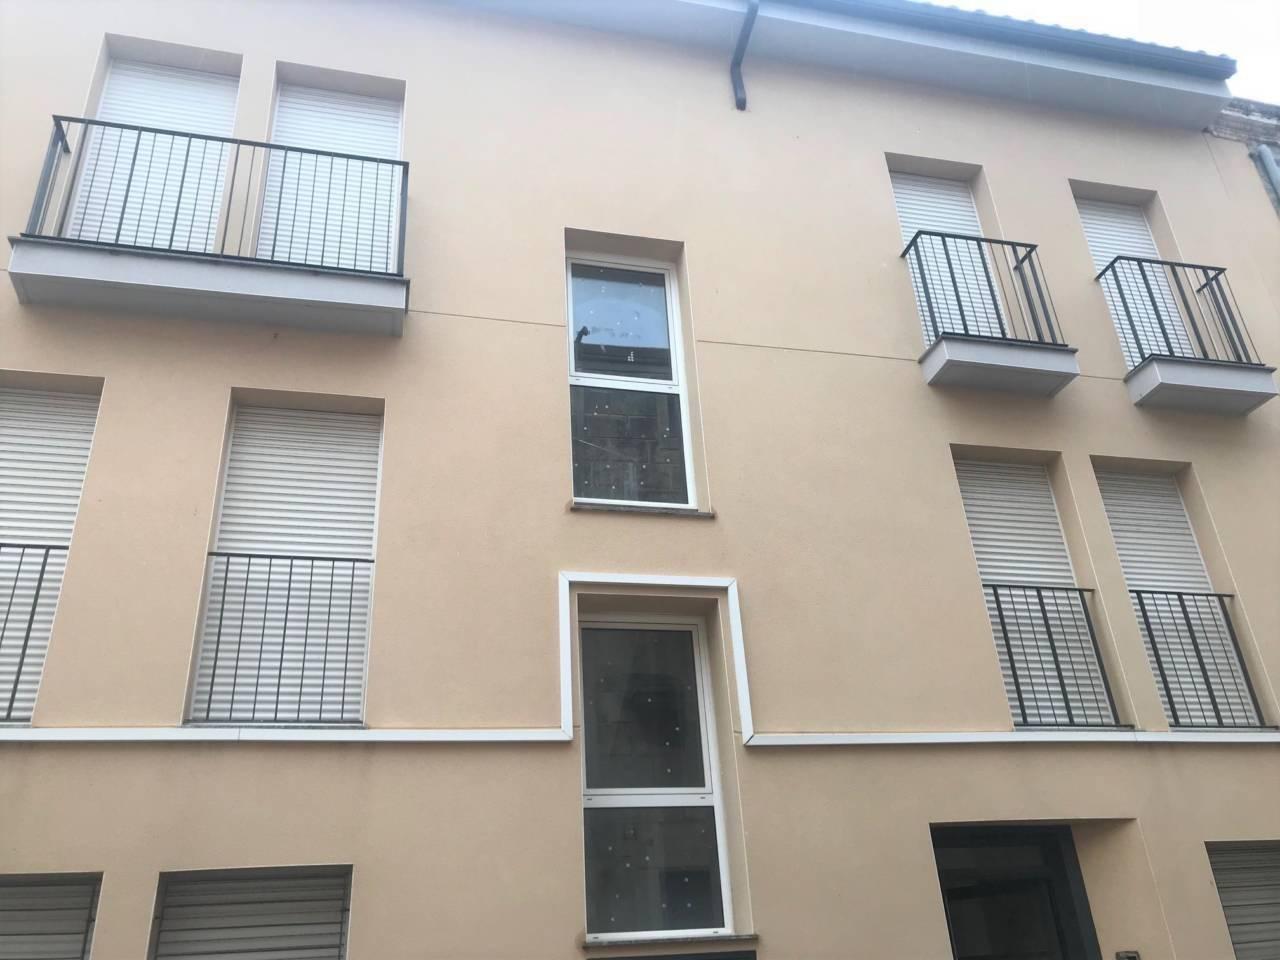 Piso  Calle major. Superf. 100 m²,  3 habitaciones,  1 baño, terraza, ascensor.